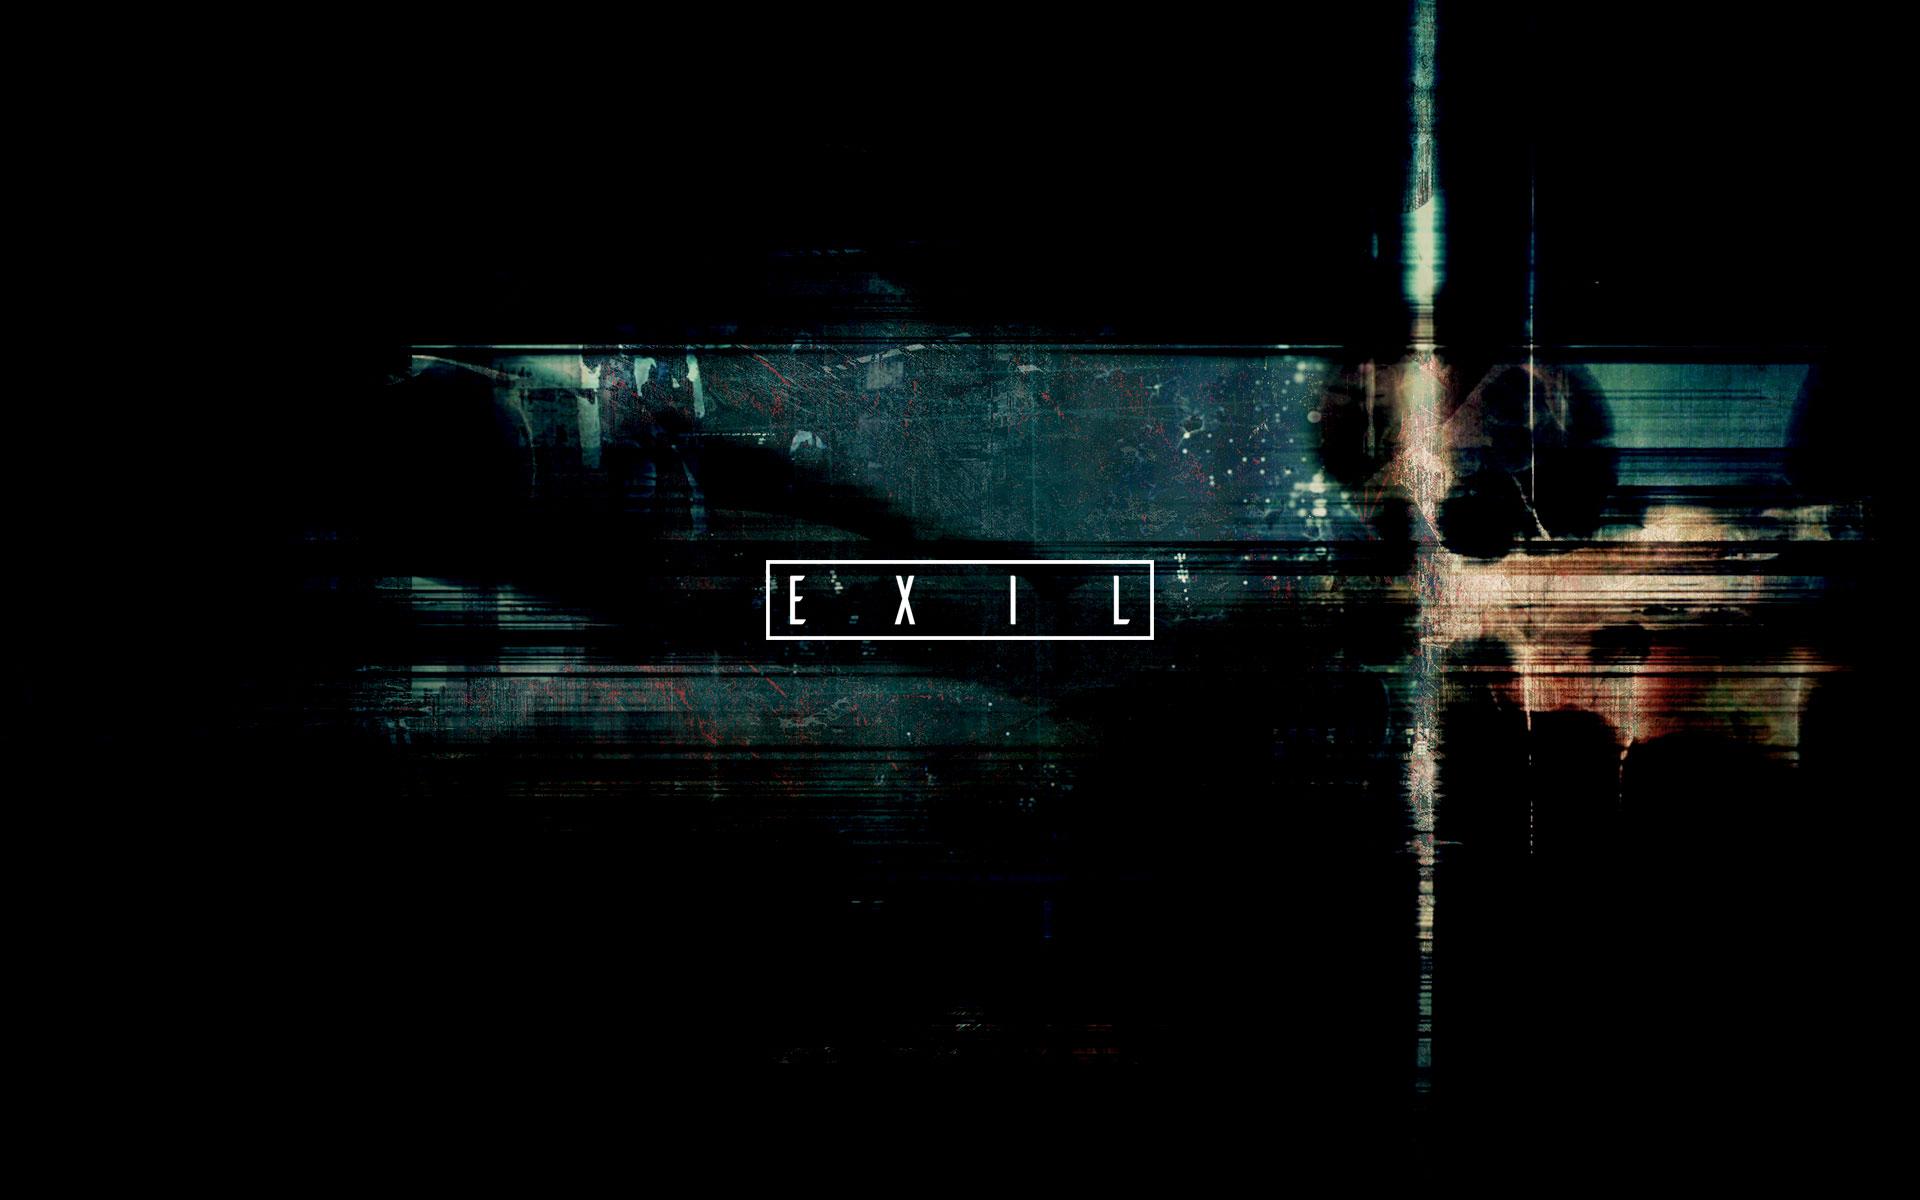 Exil-X